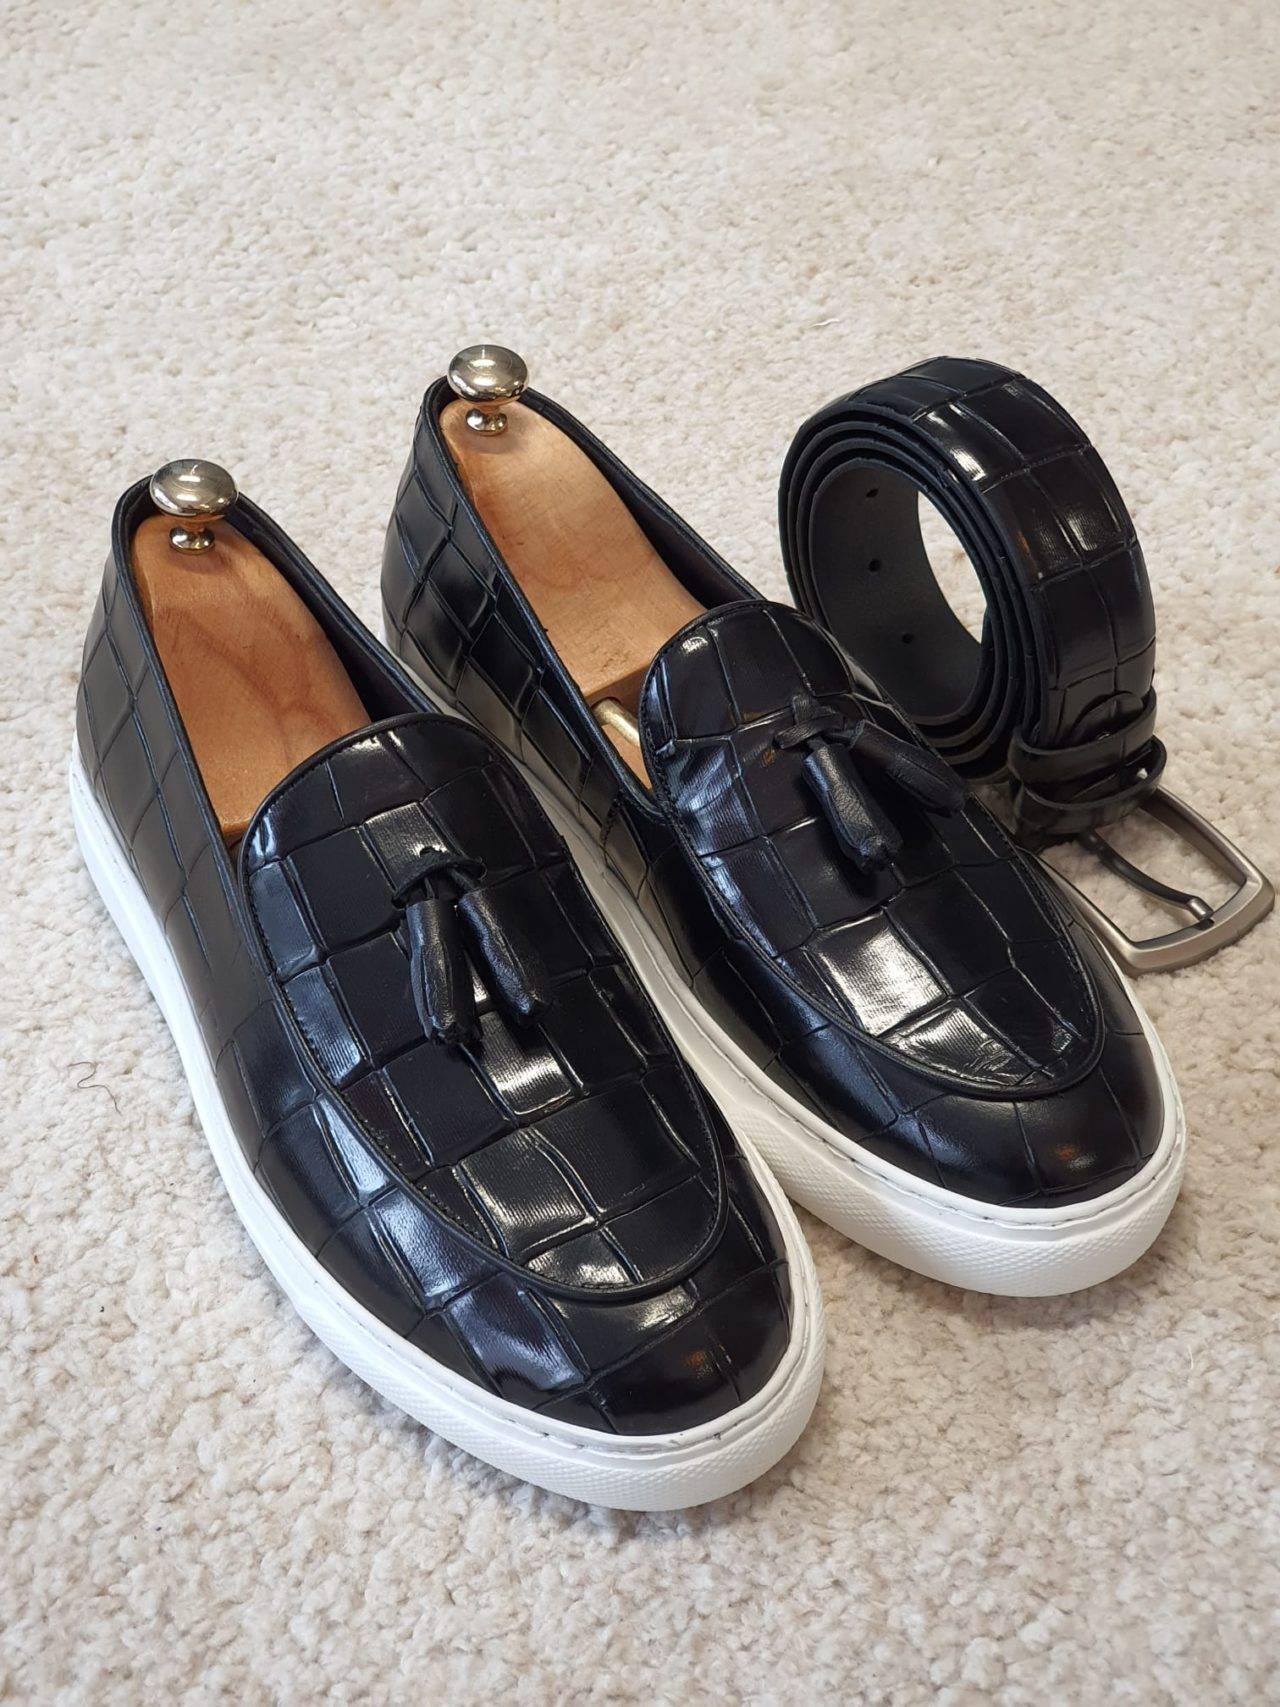 Aysoti Durham Black Tassel Loafers